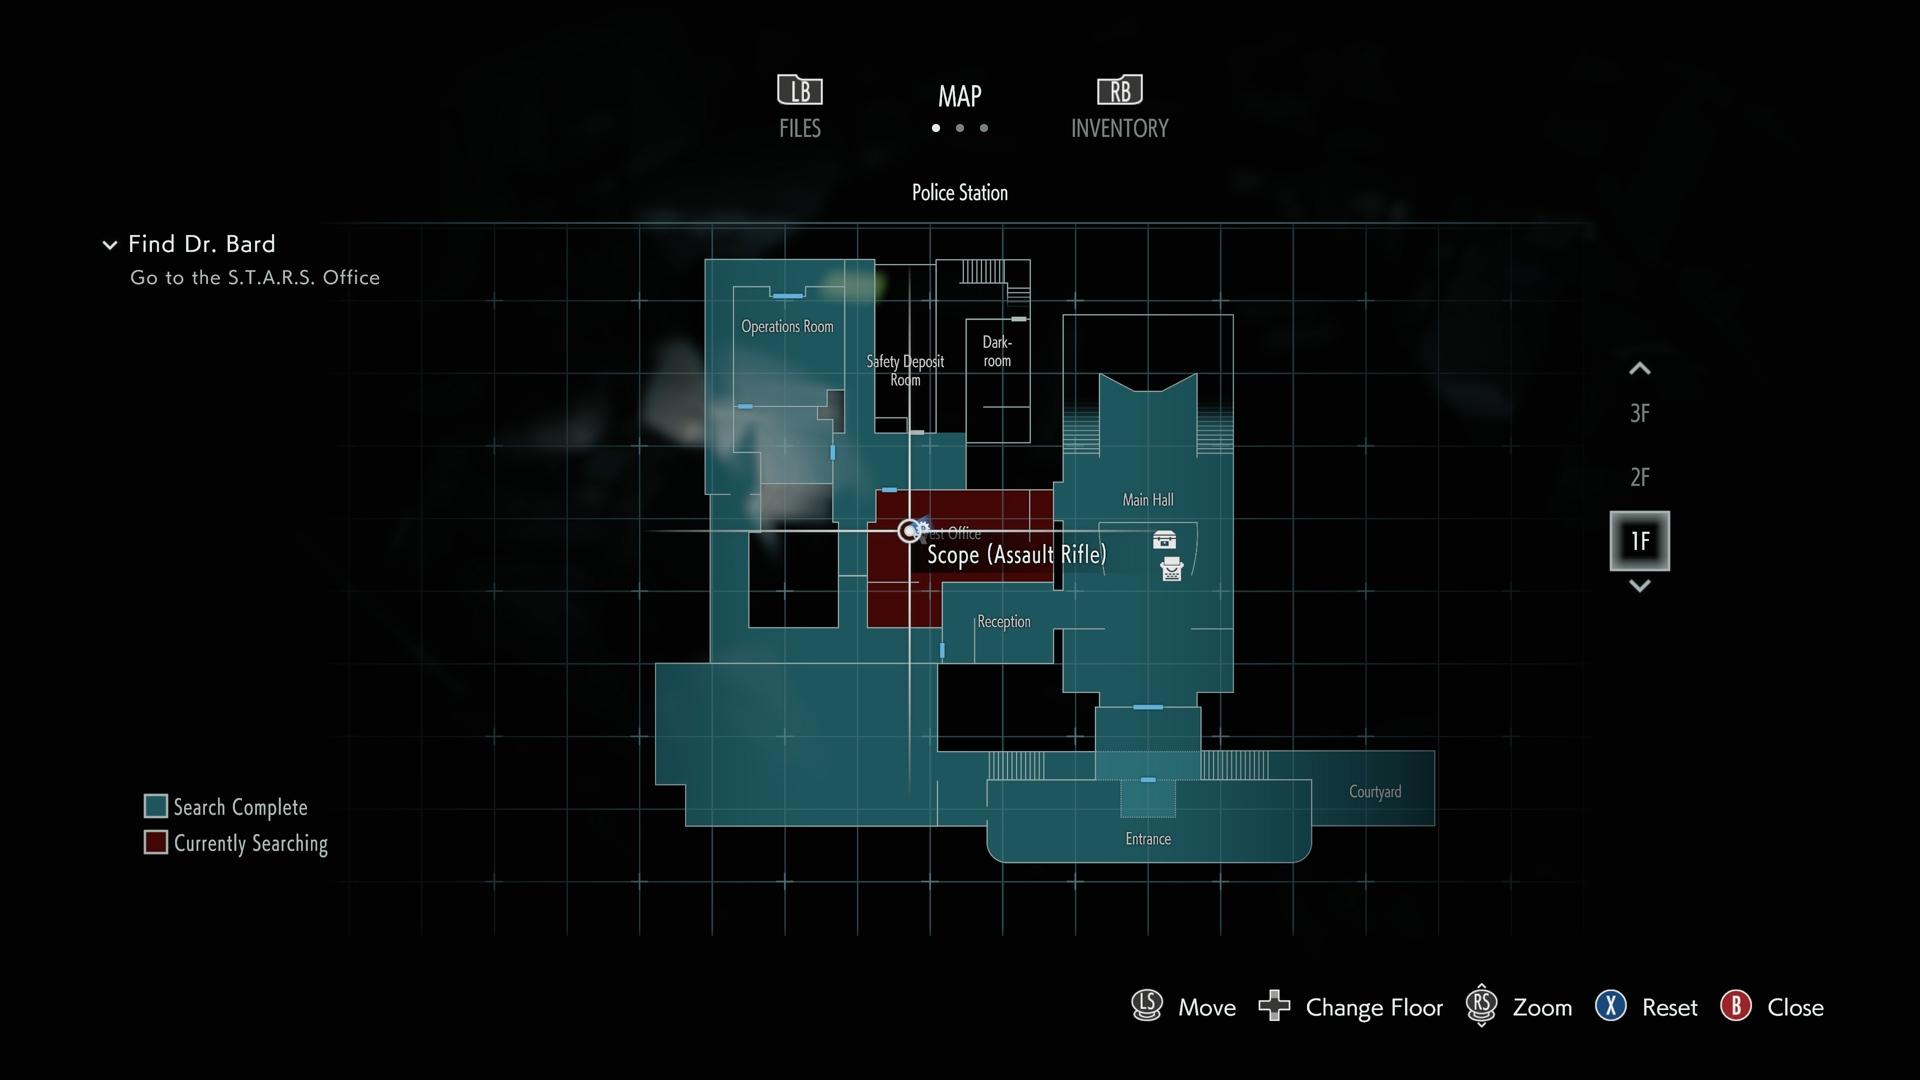 Resident Evil 3 Assault Rifle upgrade Scope location map